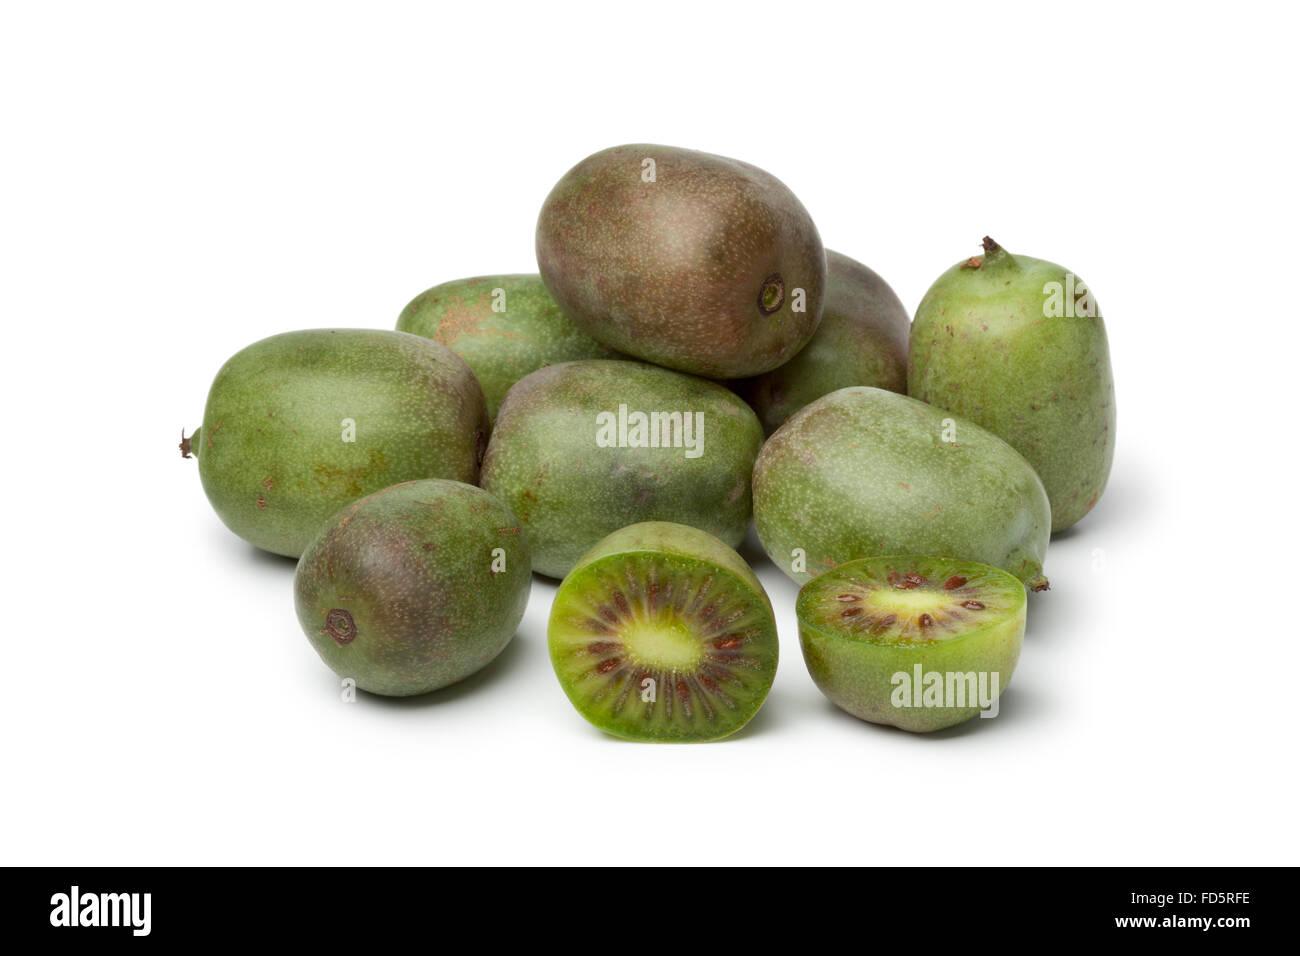 Whole and half kiwi berries on white background - Stock Image